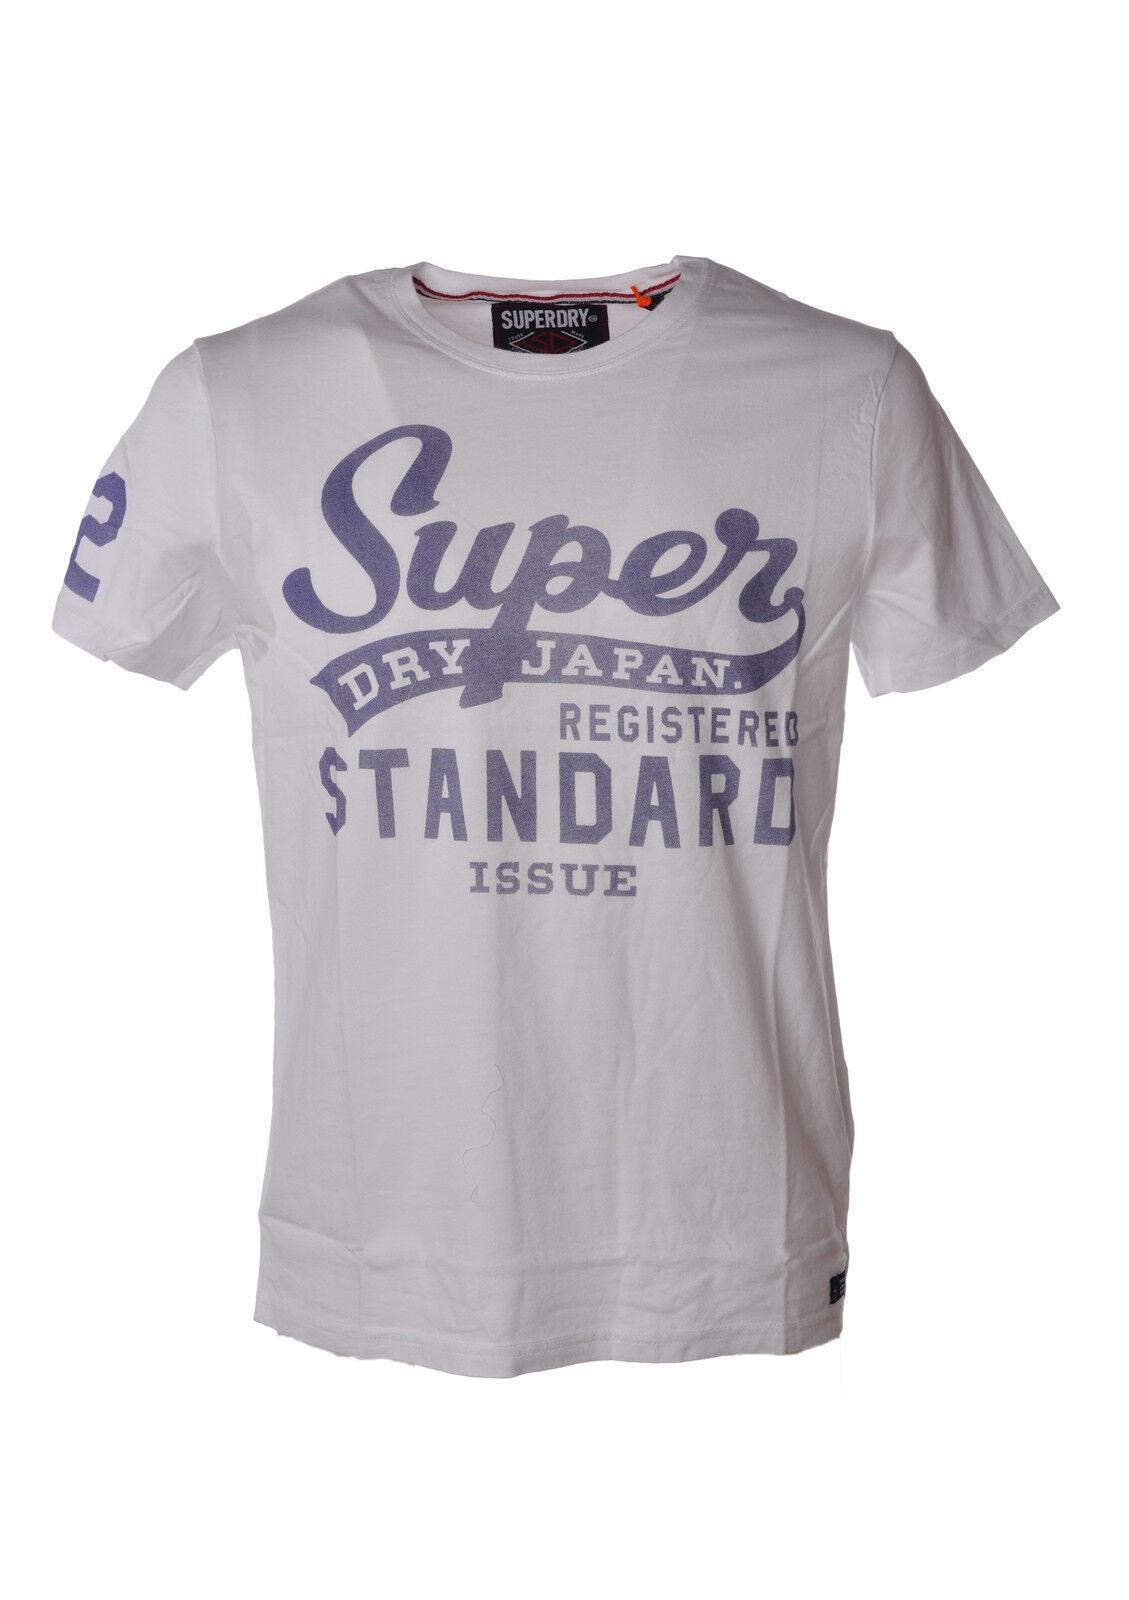 Superdry - Topwear-T-shirts - Mann - Weiß - 3479222B183808